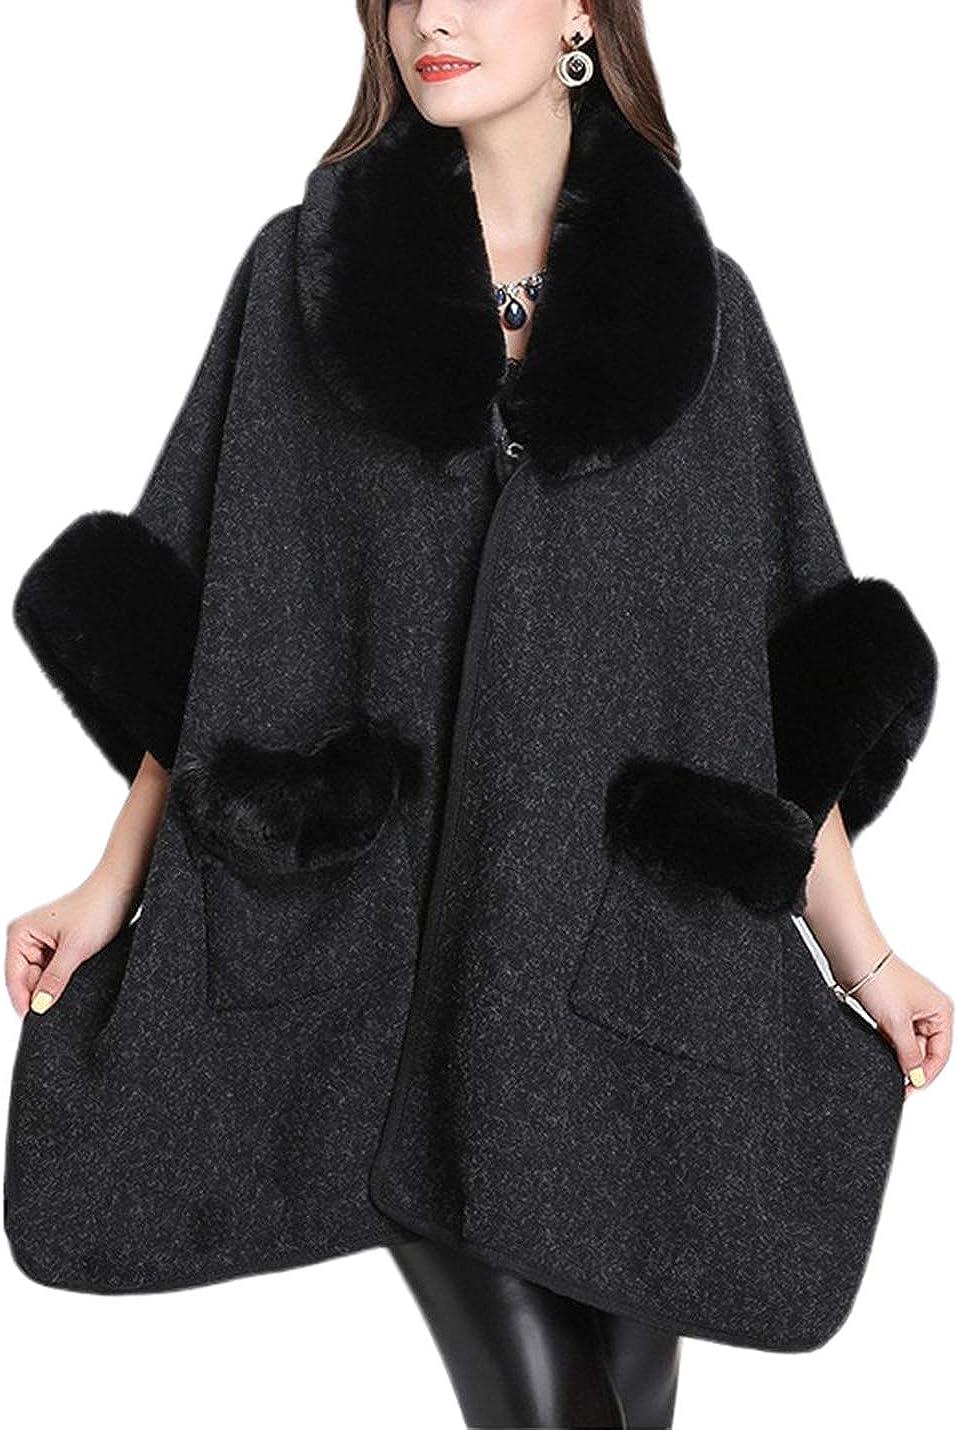 Lentta Women's Loose Fit Turn Down Collar Faux Fur Trim Wool Cardigans Outercoat